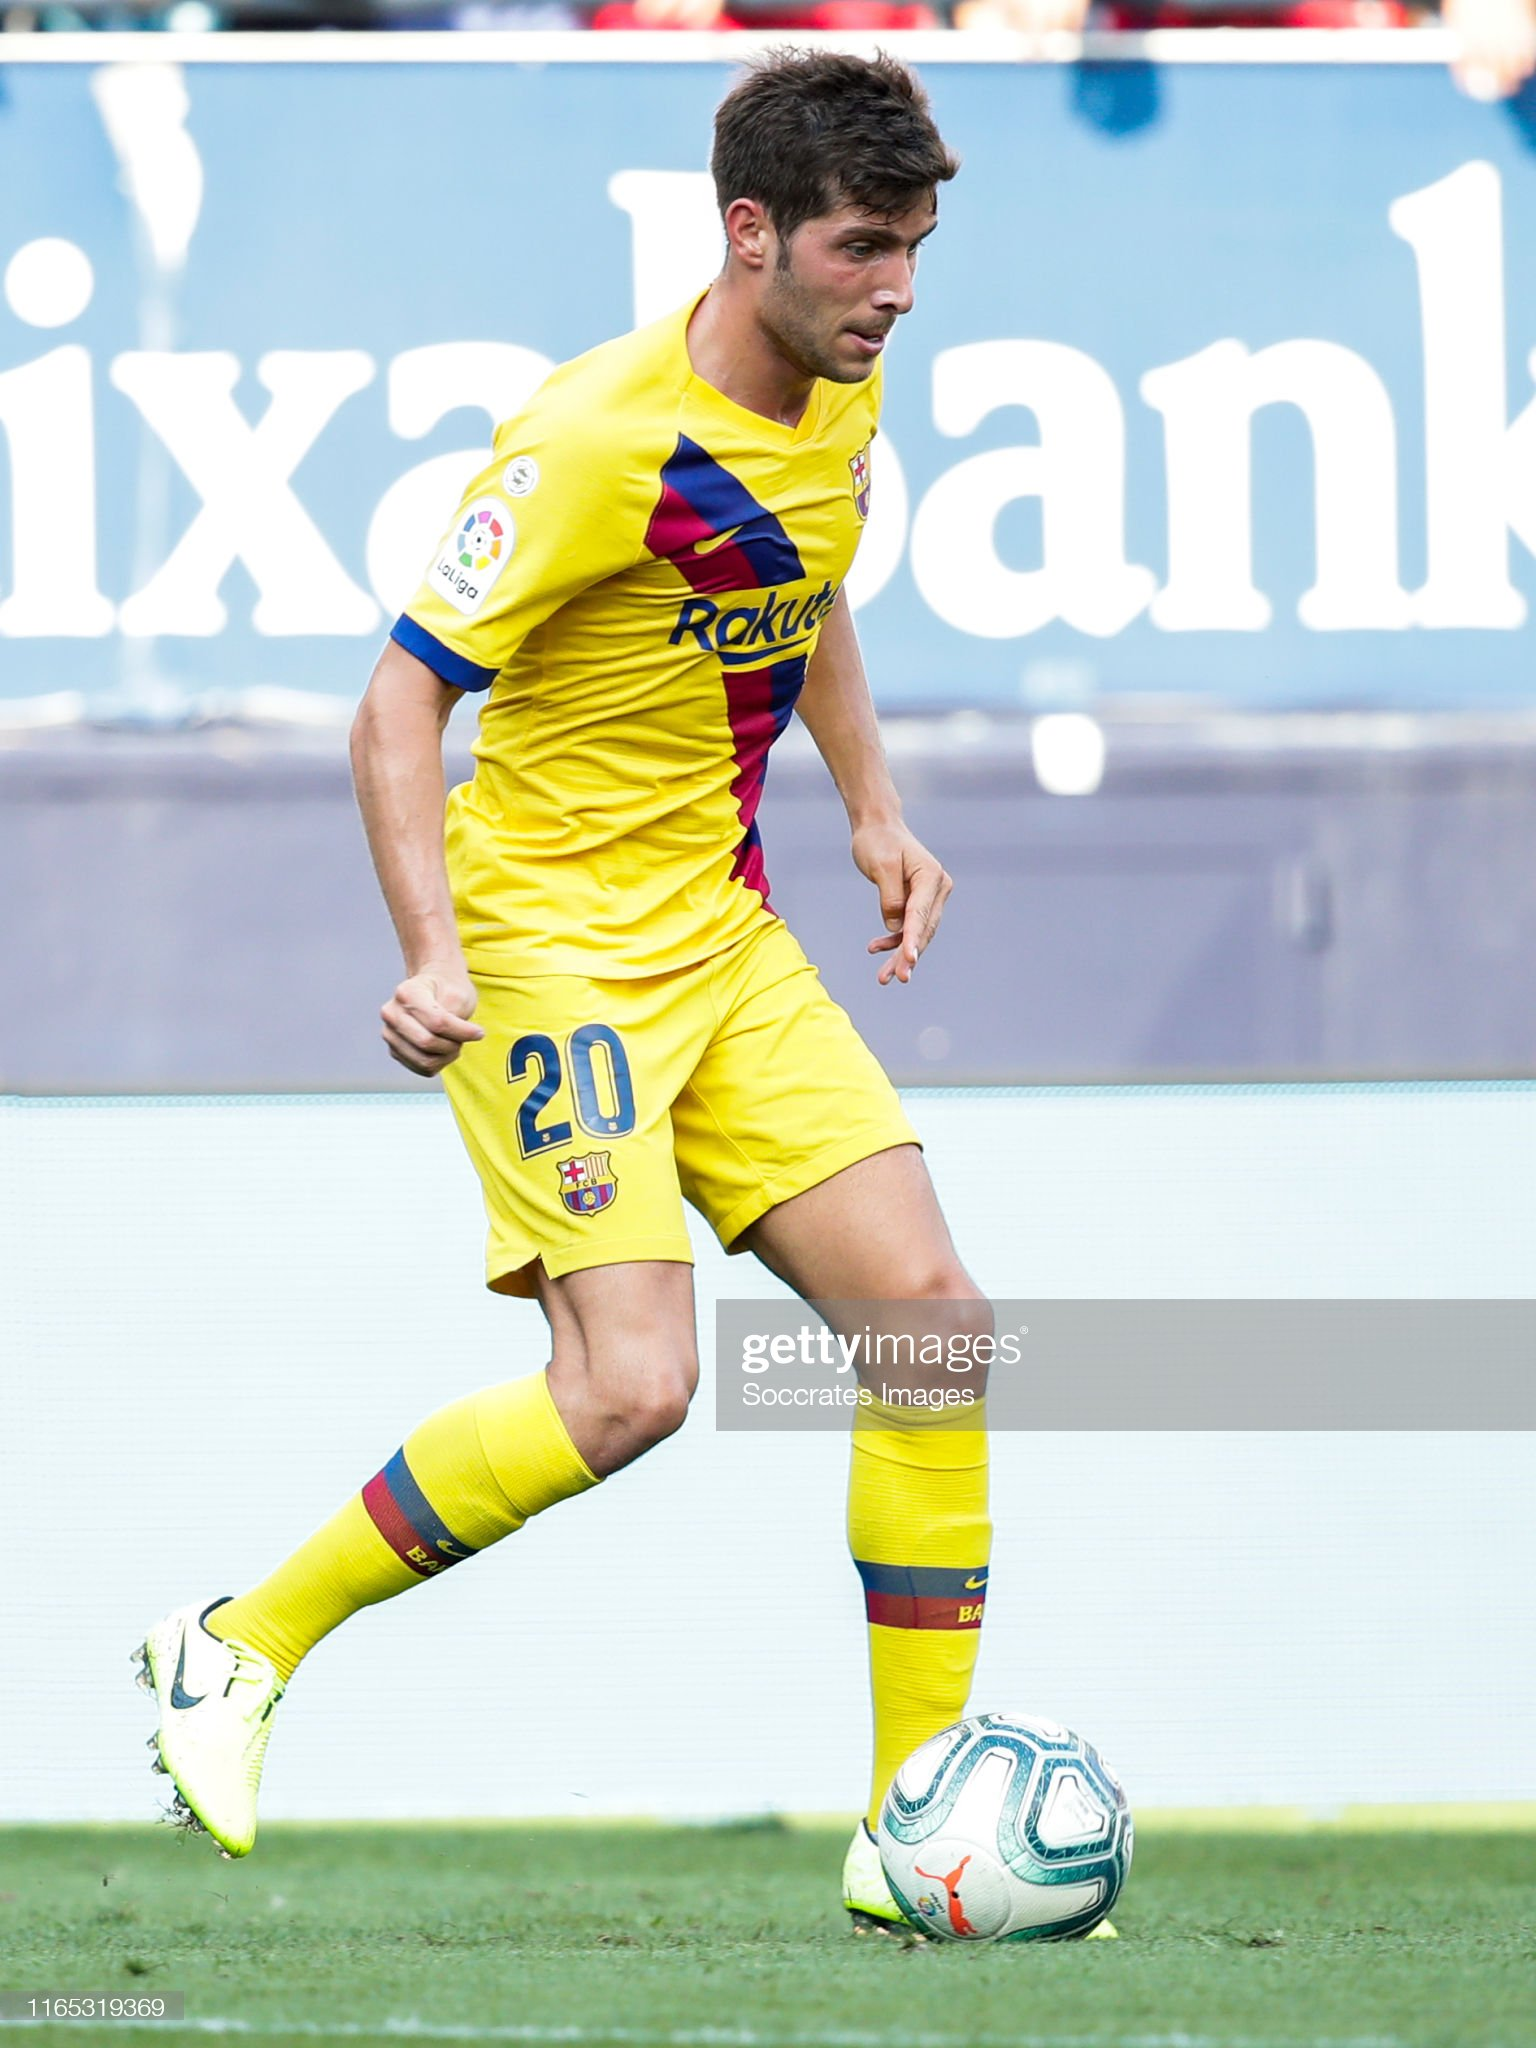 صور مباراة : أوساسونا - برشلونة 2-2 ( 31-08-2019 )  Sergi-roberto-of-fc-barcelona-during-the-la-liga-santander-match-v-picture-id1165319369?s=2048x2048